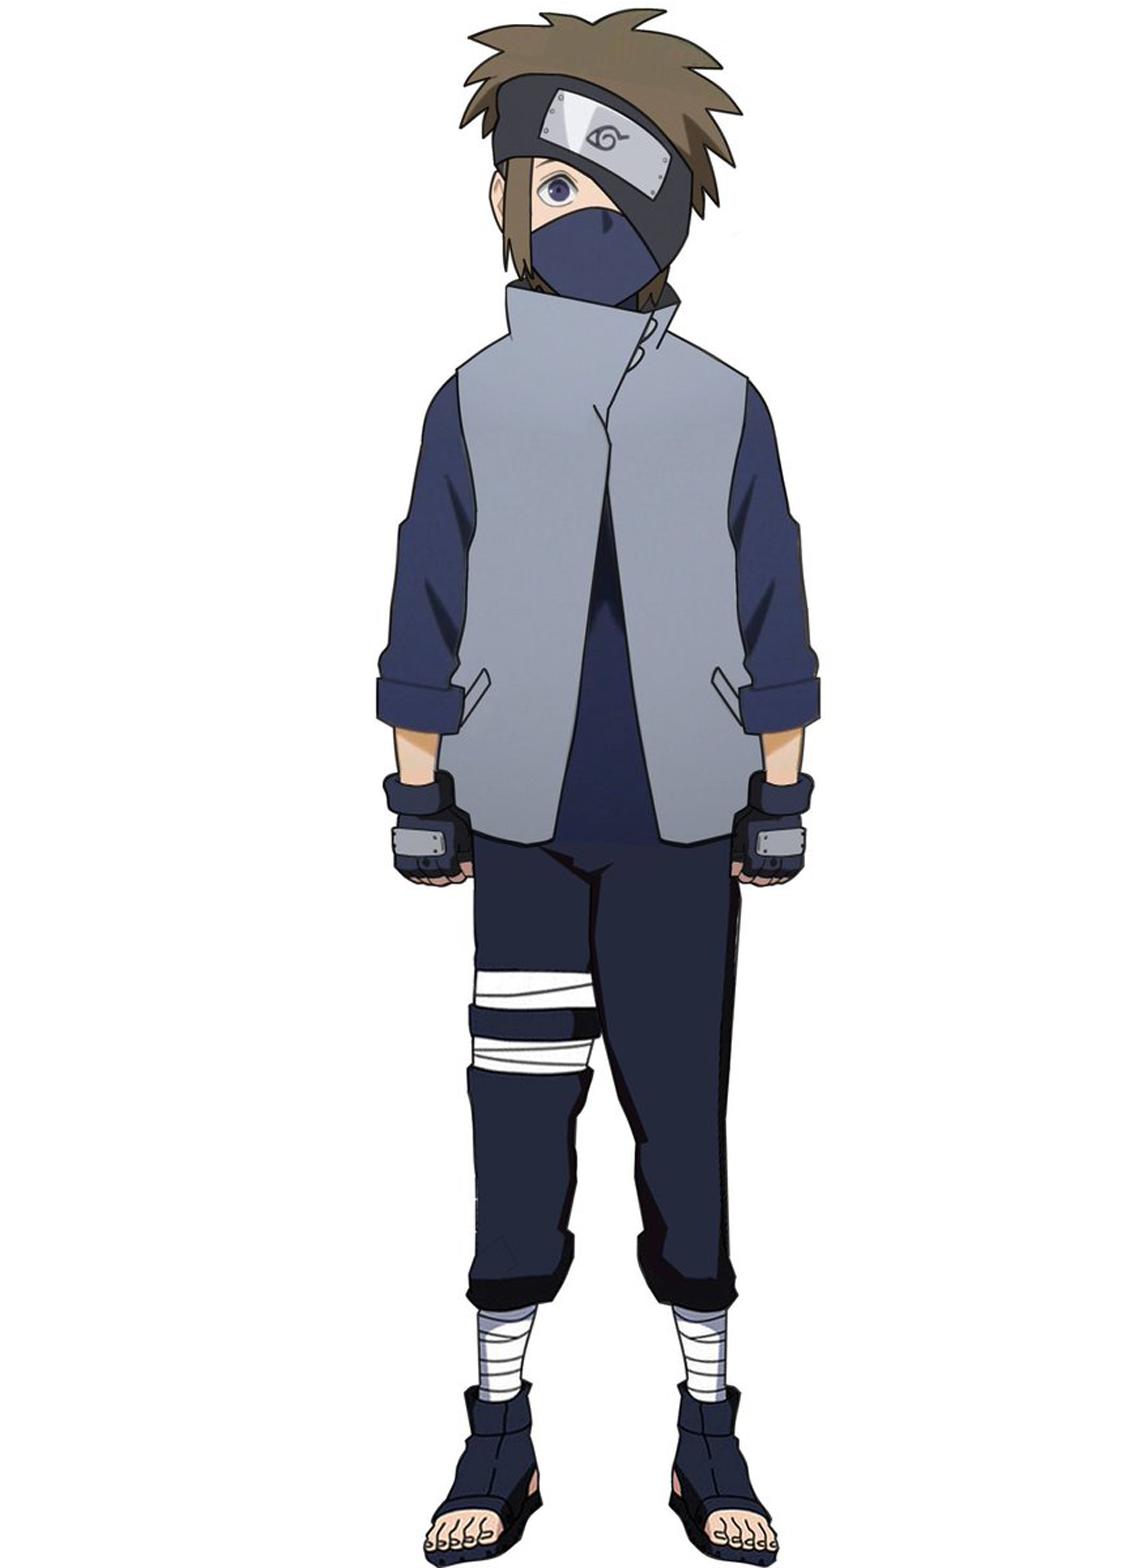 Houki takotori | Animes boruto, Personagens de anime, Anime